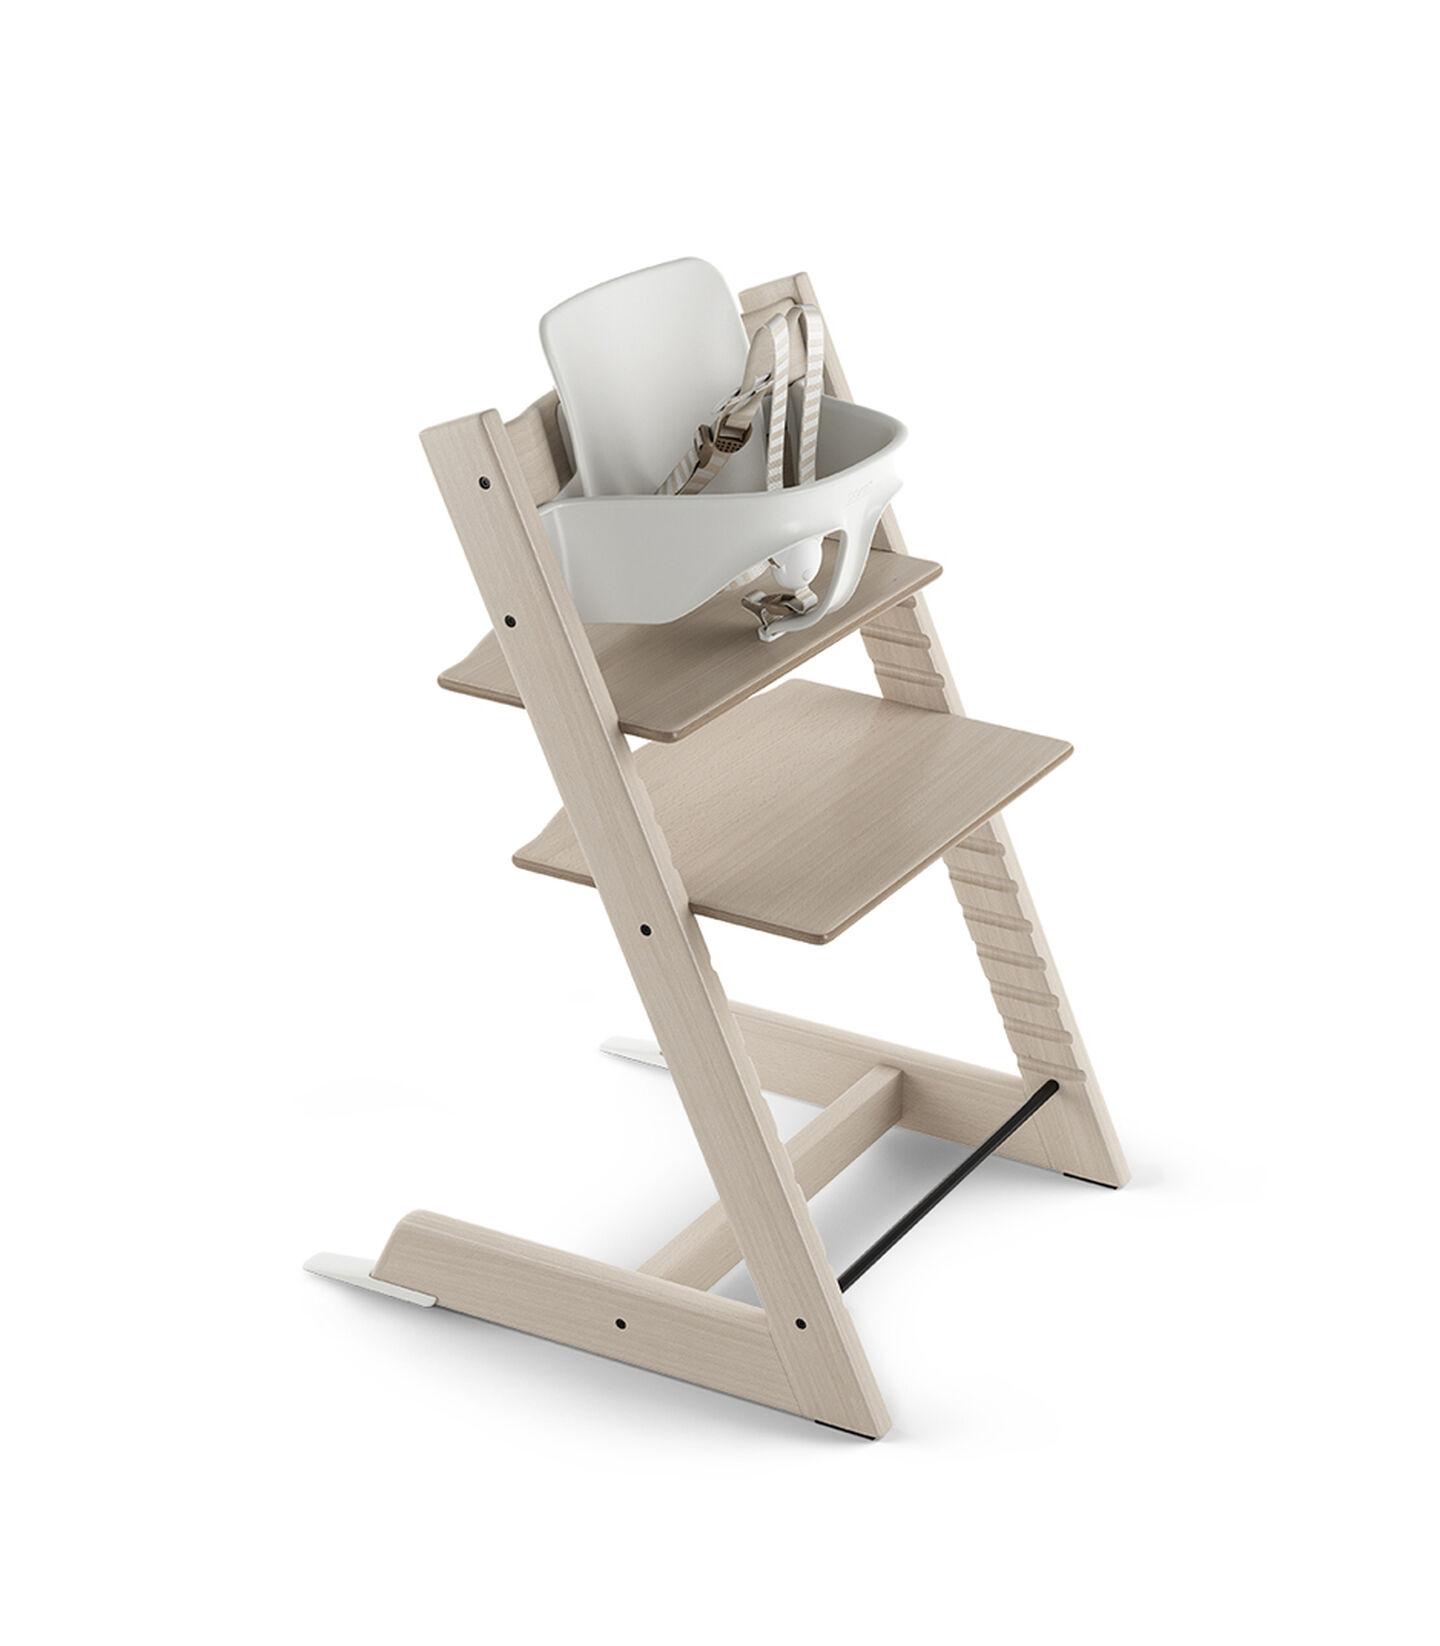 Tripp Trapp® Bundle High Chair US 18 Whitewash, Whitewash, mainview view 1